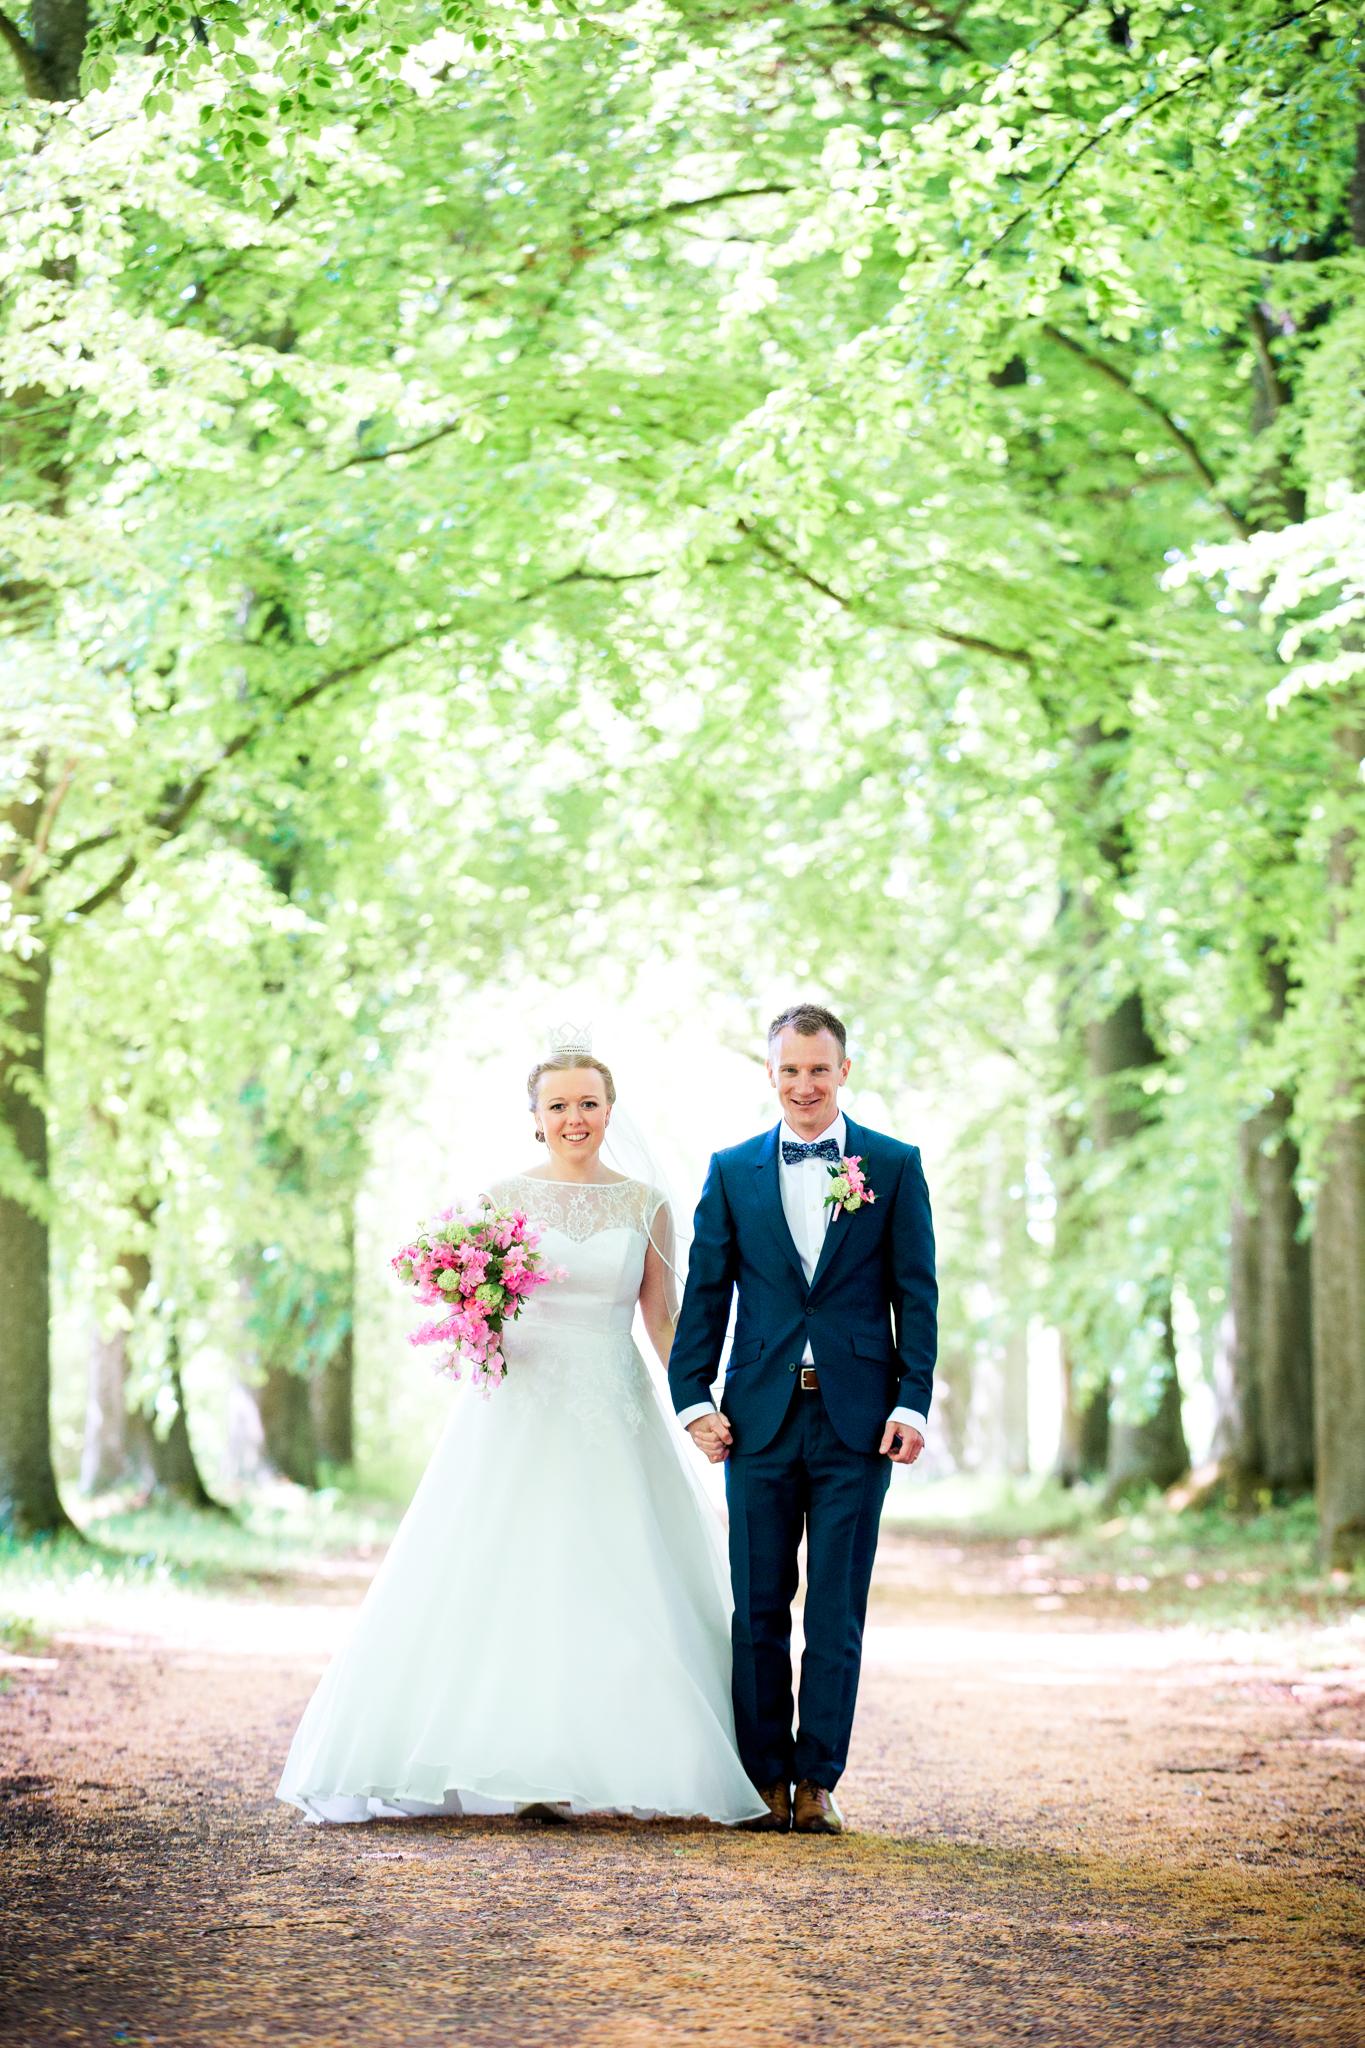 ViOli Photography bröllopsfotograf-Karlshamn-Blekinge-Ronneby-Karlskrona-Sölvesborg-Bromölla-Kristianstad (8 av 35)